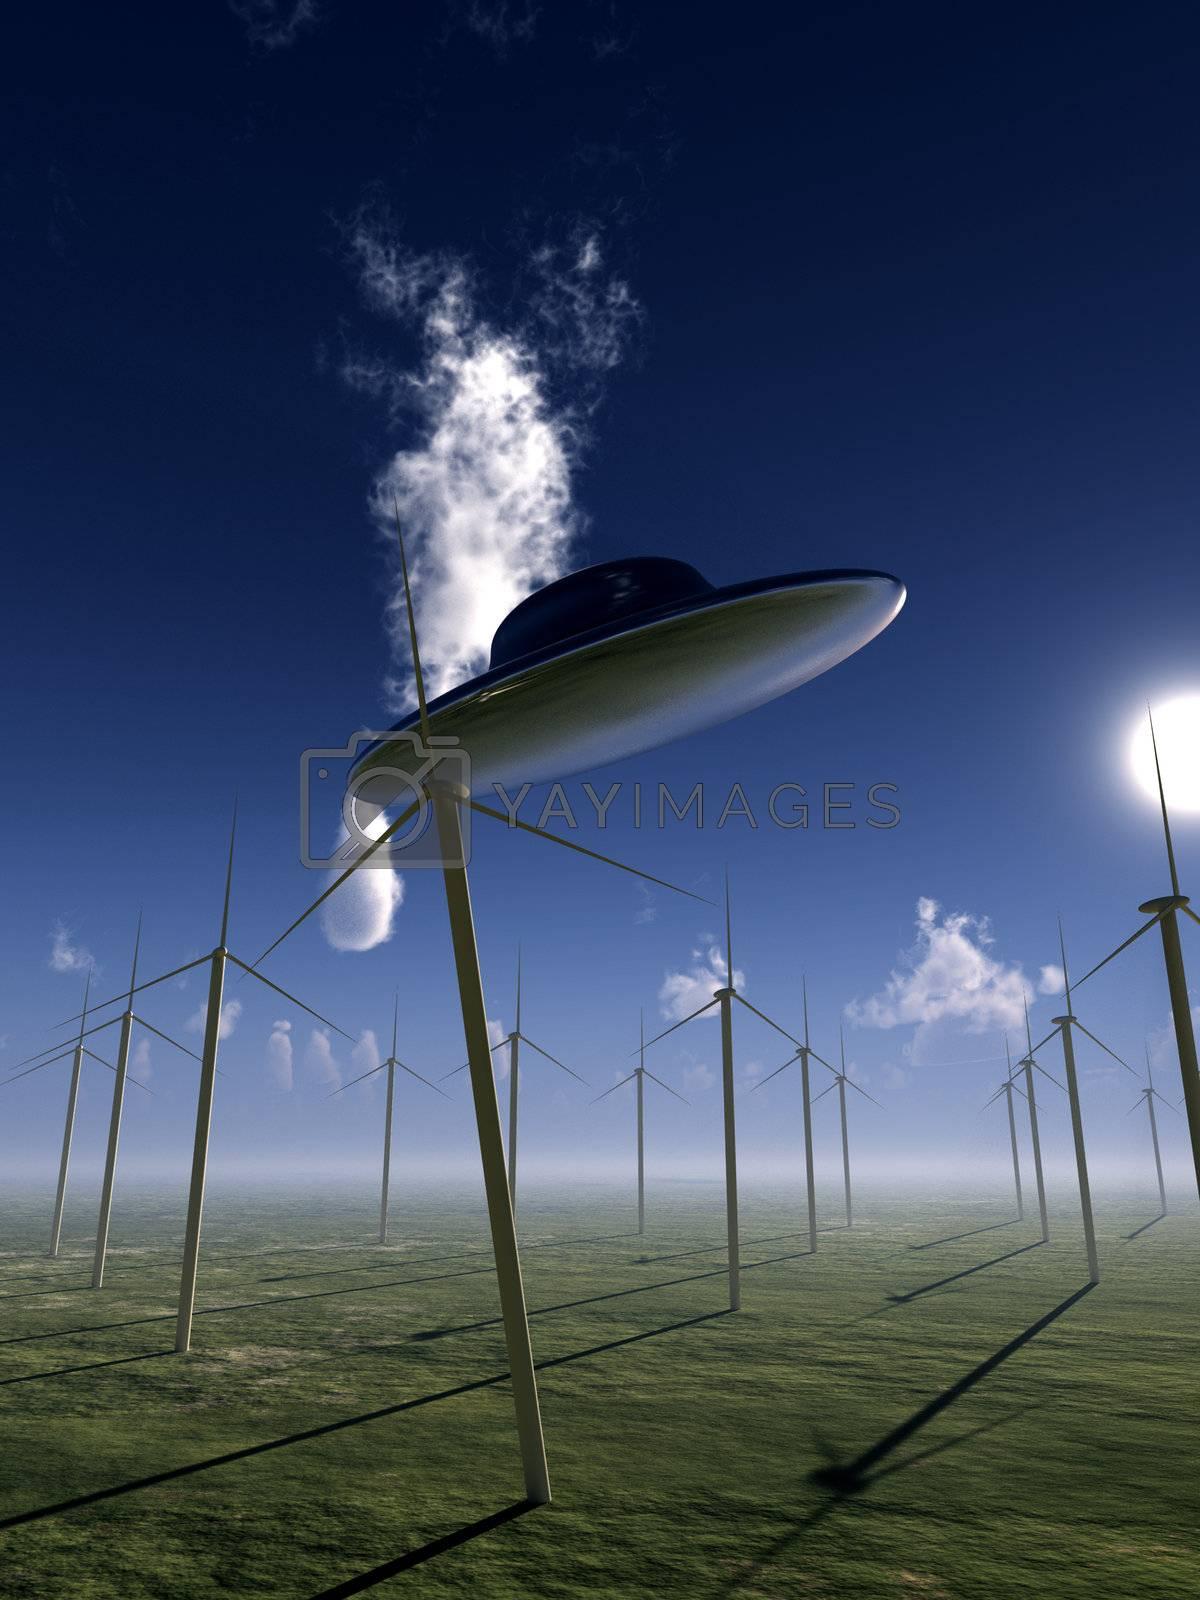 Royalty free image of UFO And Wind Turbine  by harveysart